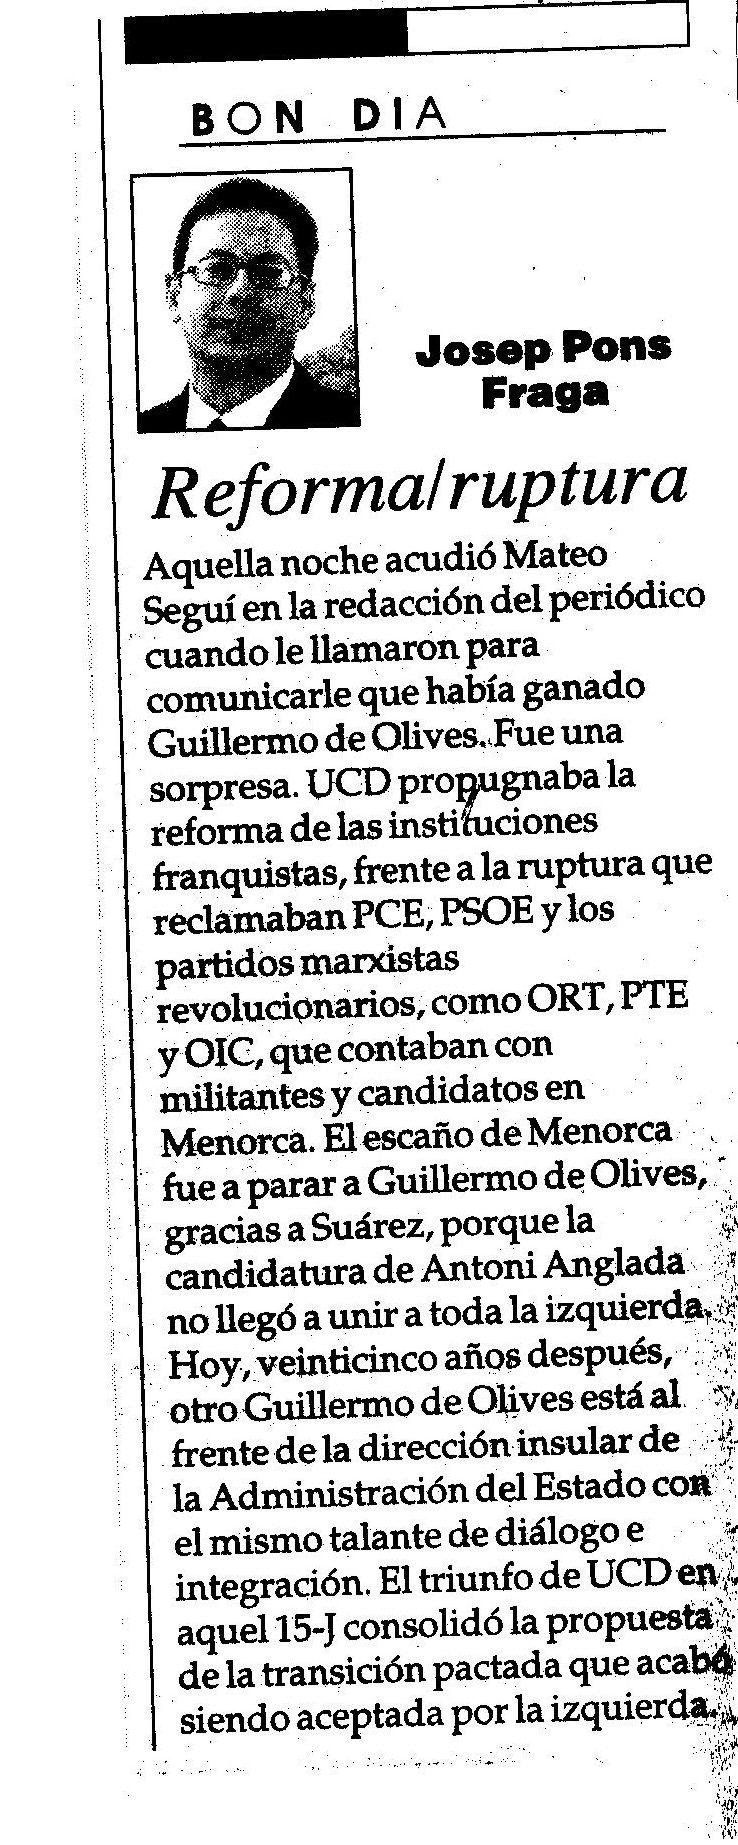 2002-06-16 Reforma-Ruptura